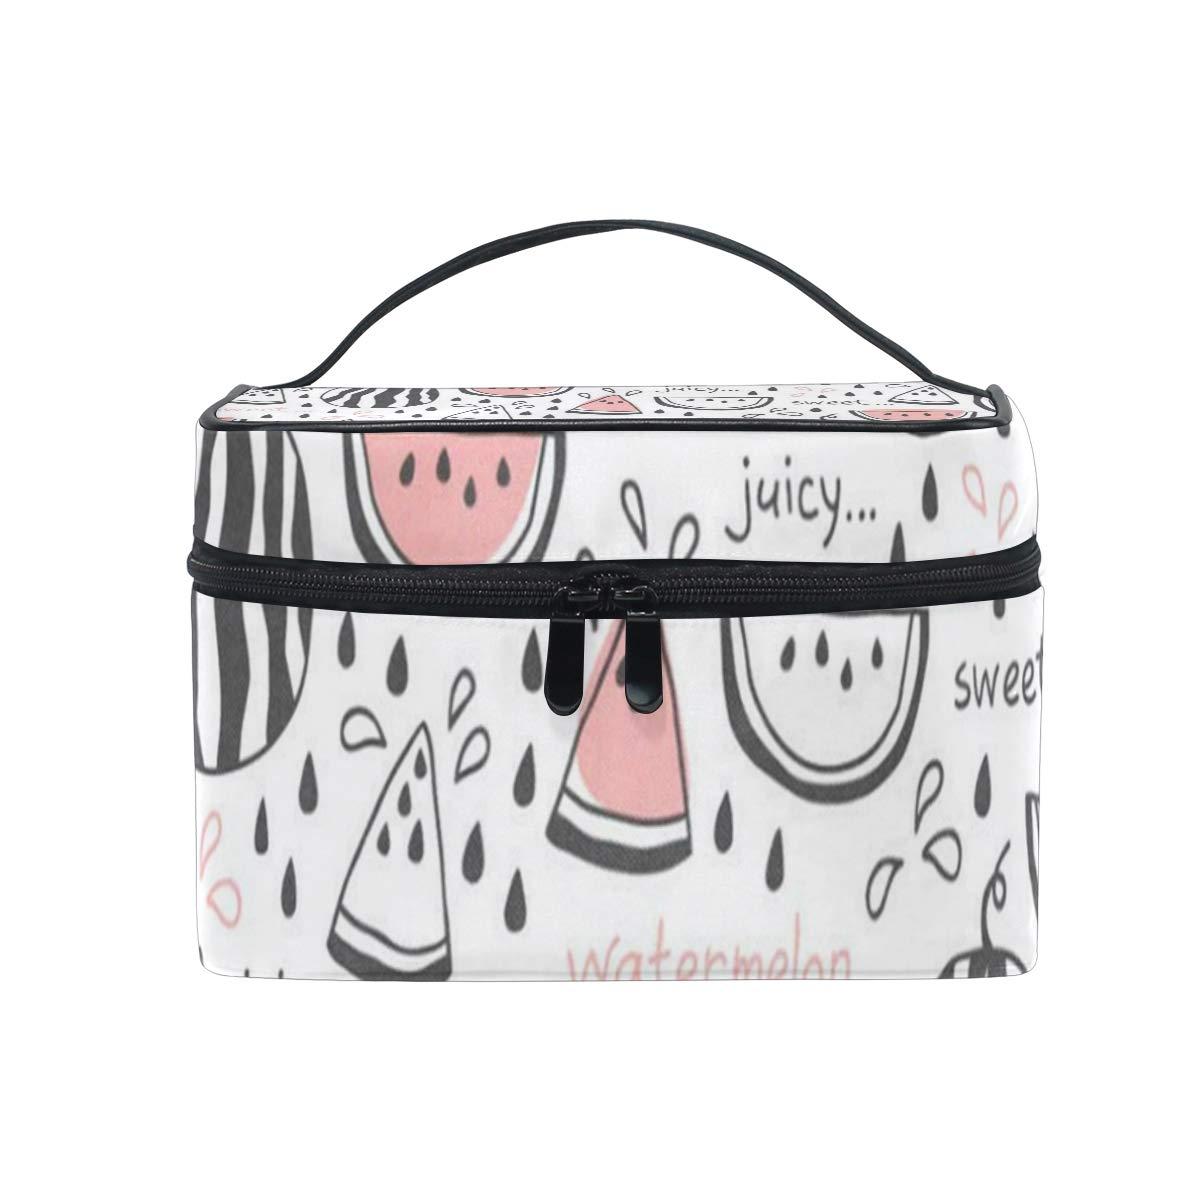 a47b5bffa548 Amazon.com : Travel Cosmetic Bag Watermelons Toiletry Makeup Bag ...